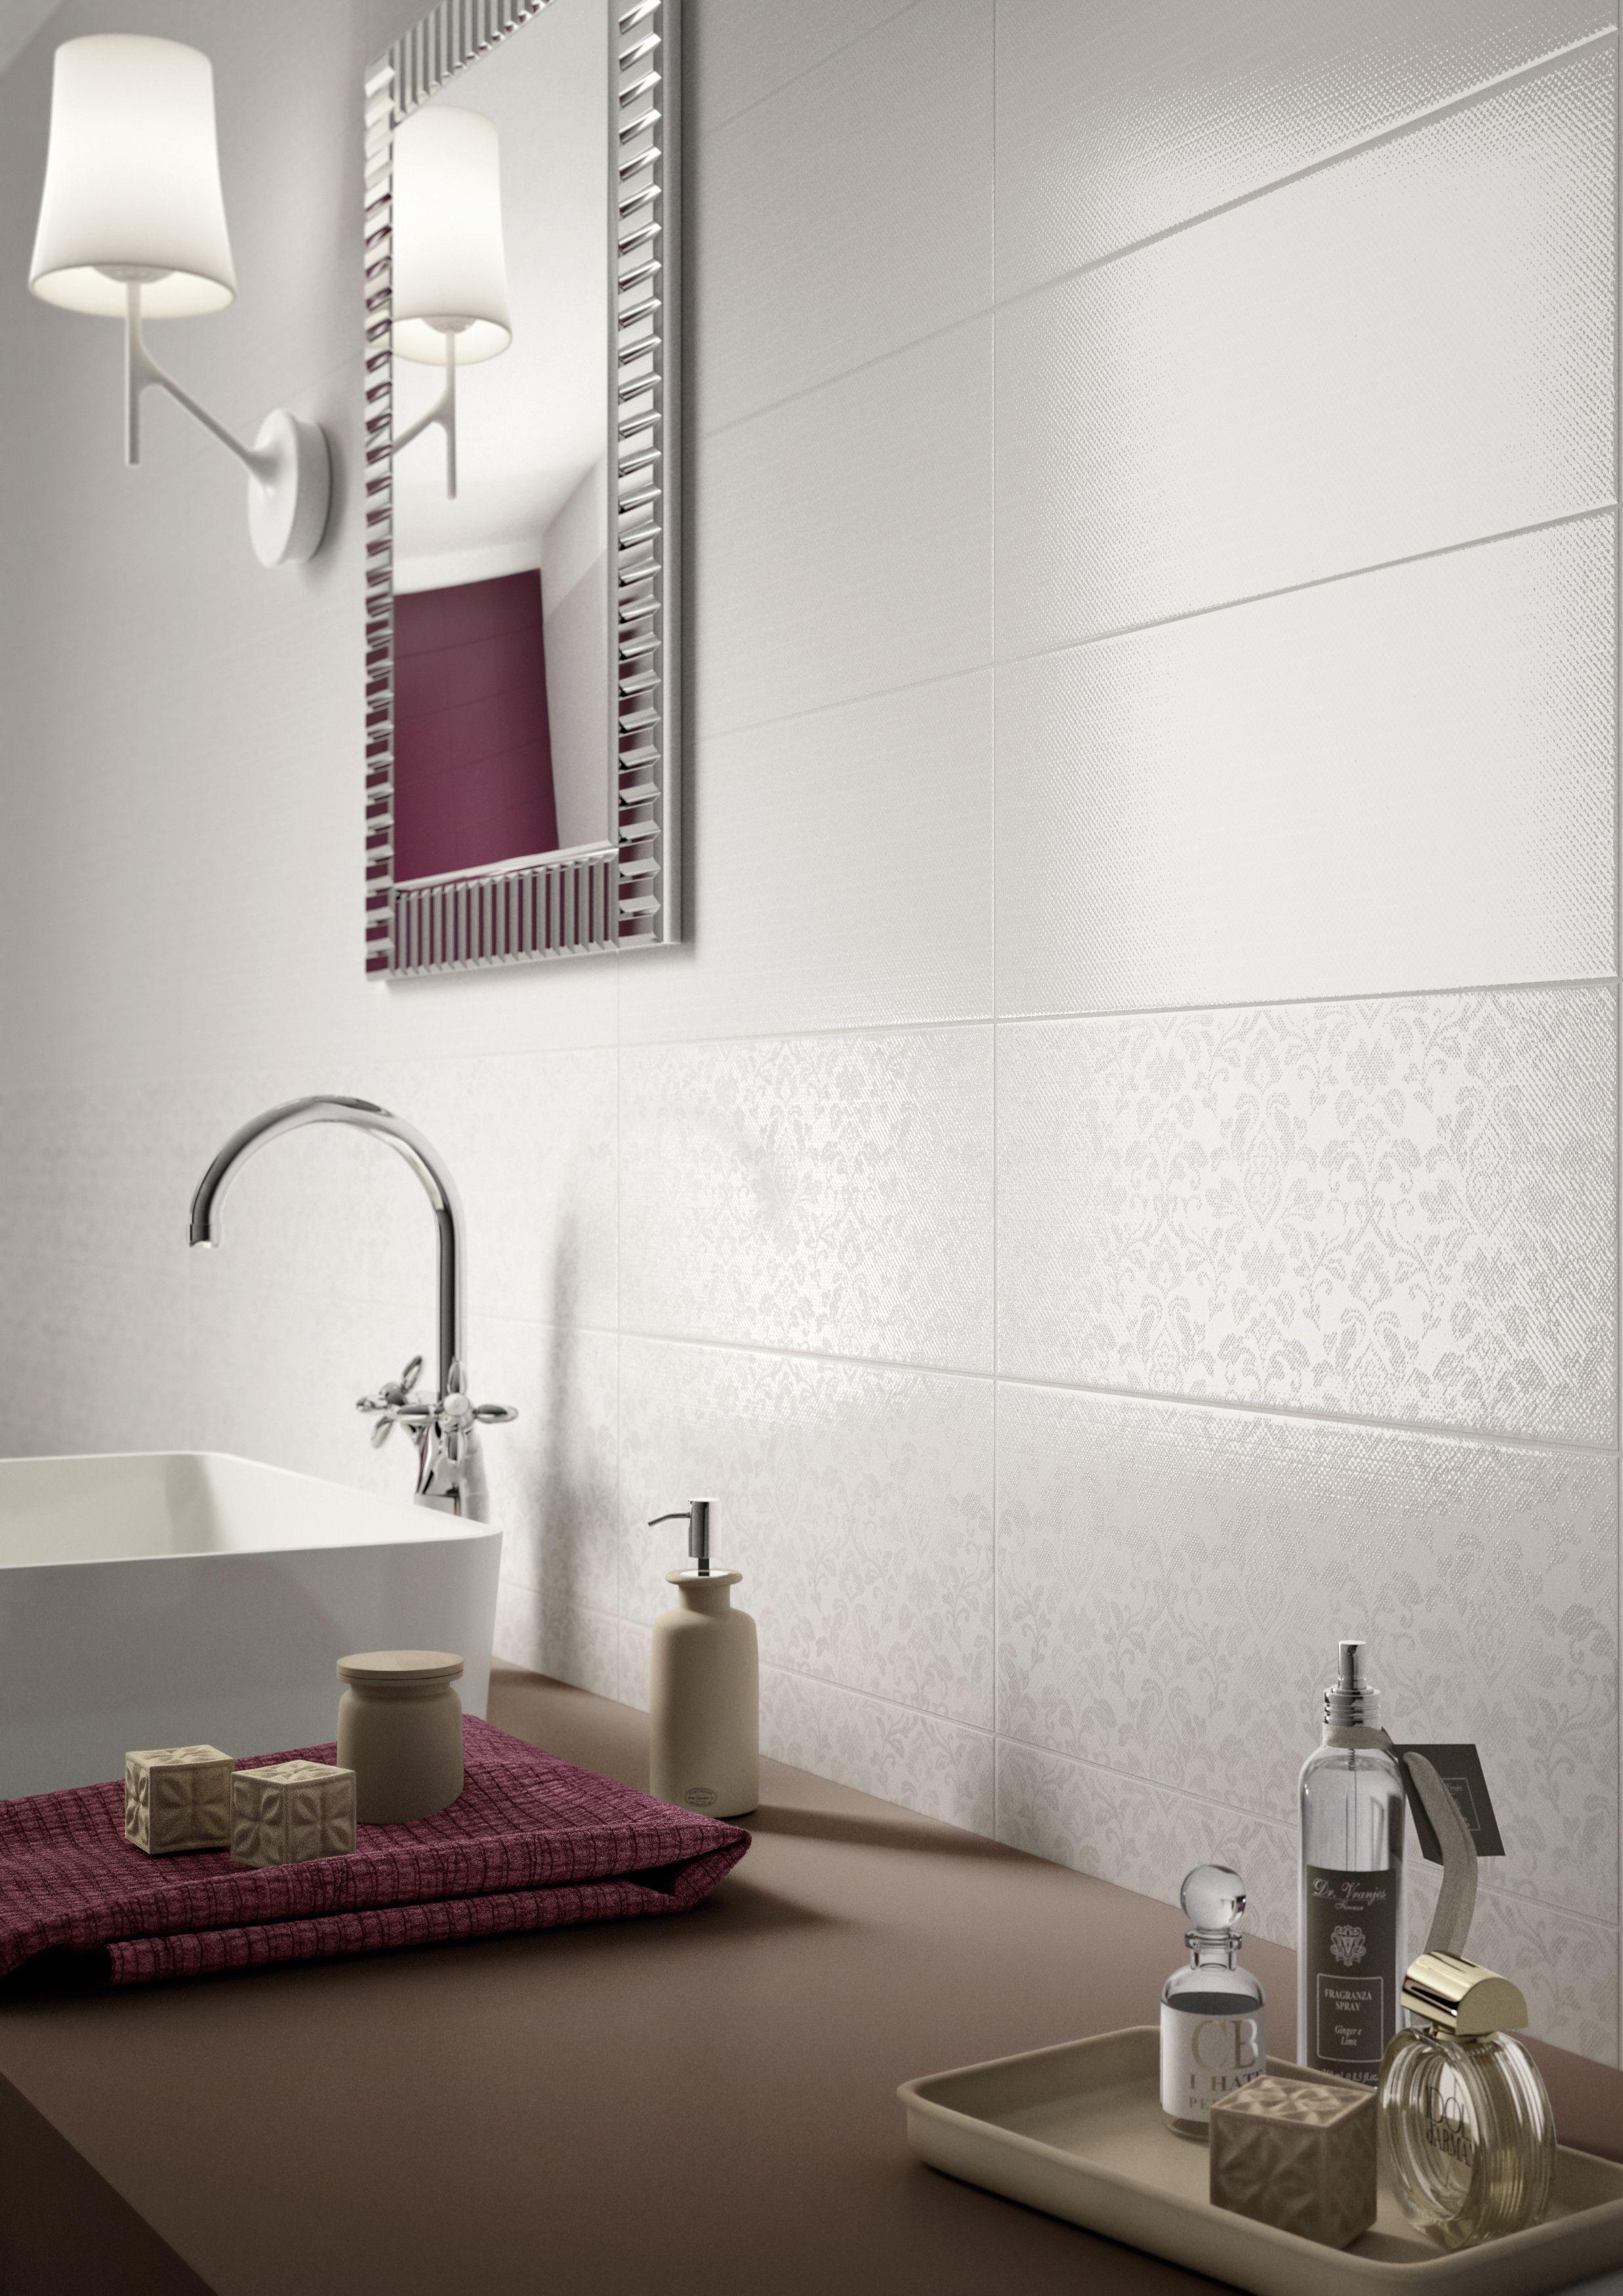 Vanite Salle De Bain Ciot ~ marazzi shine white 20×50 cm mh9k feinsteinzeug gewebeoptik